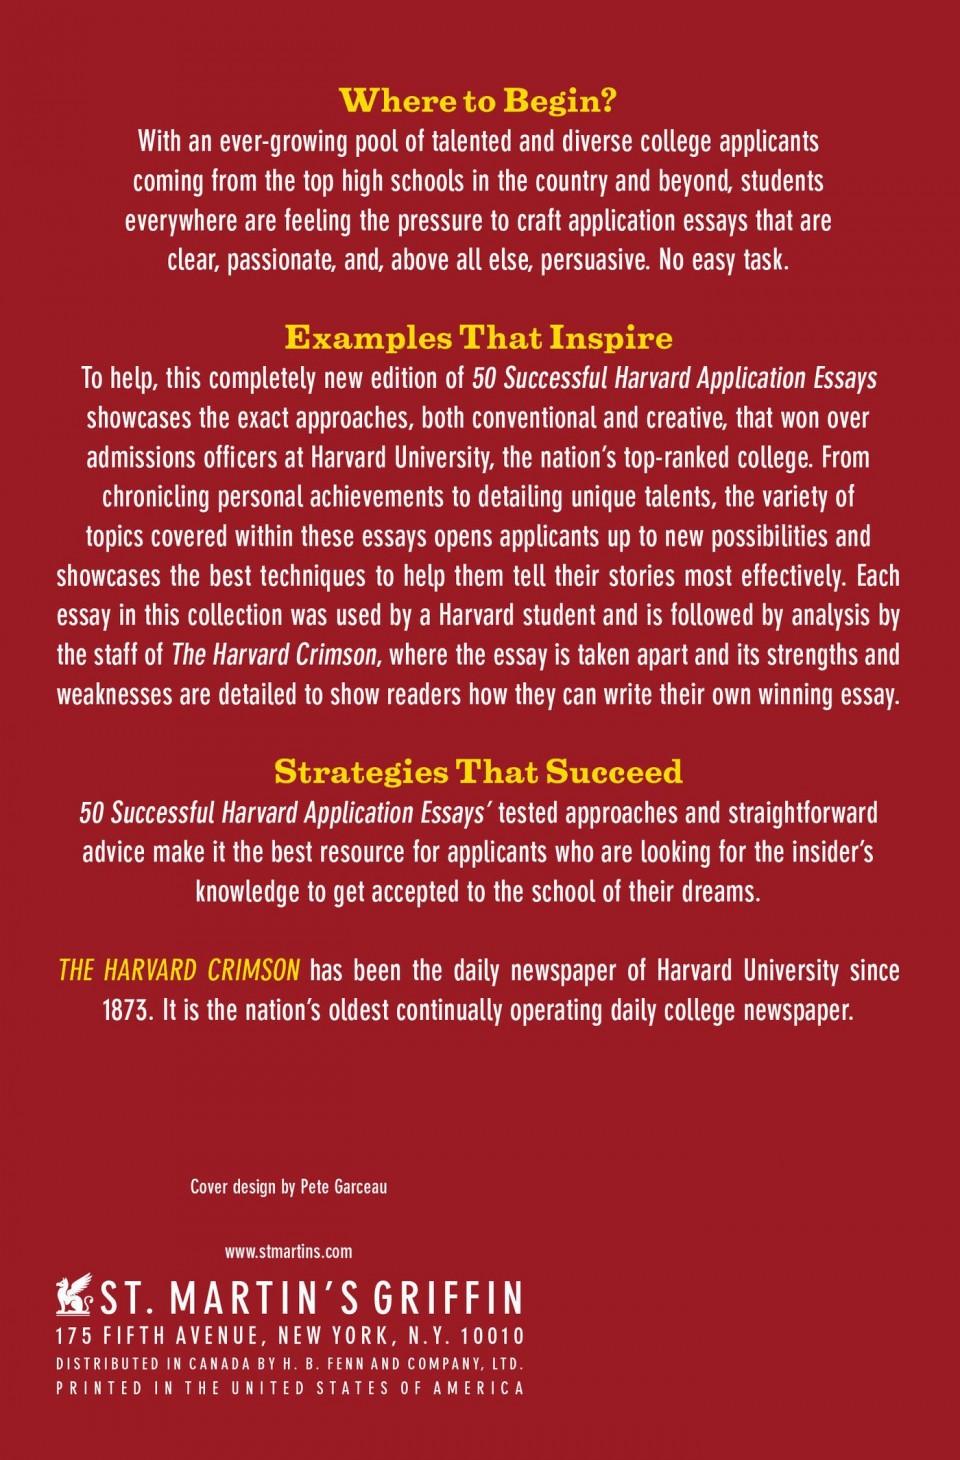 009 815kp6cfuhl Harvard Acceptance Essays Essay Frightening 50 Successful Application Pdf Free 2017 3rd Edition 960